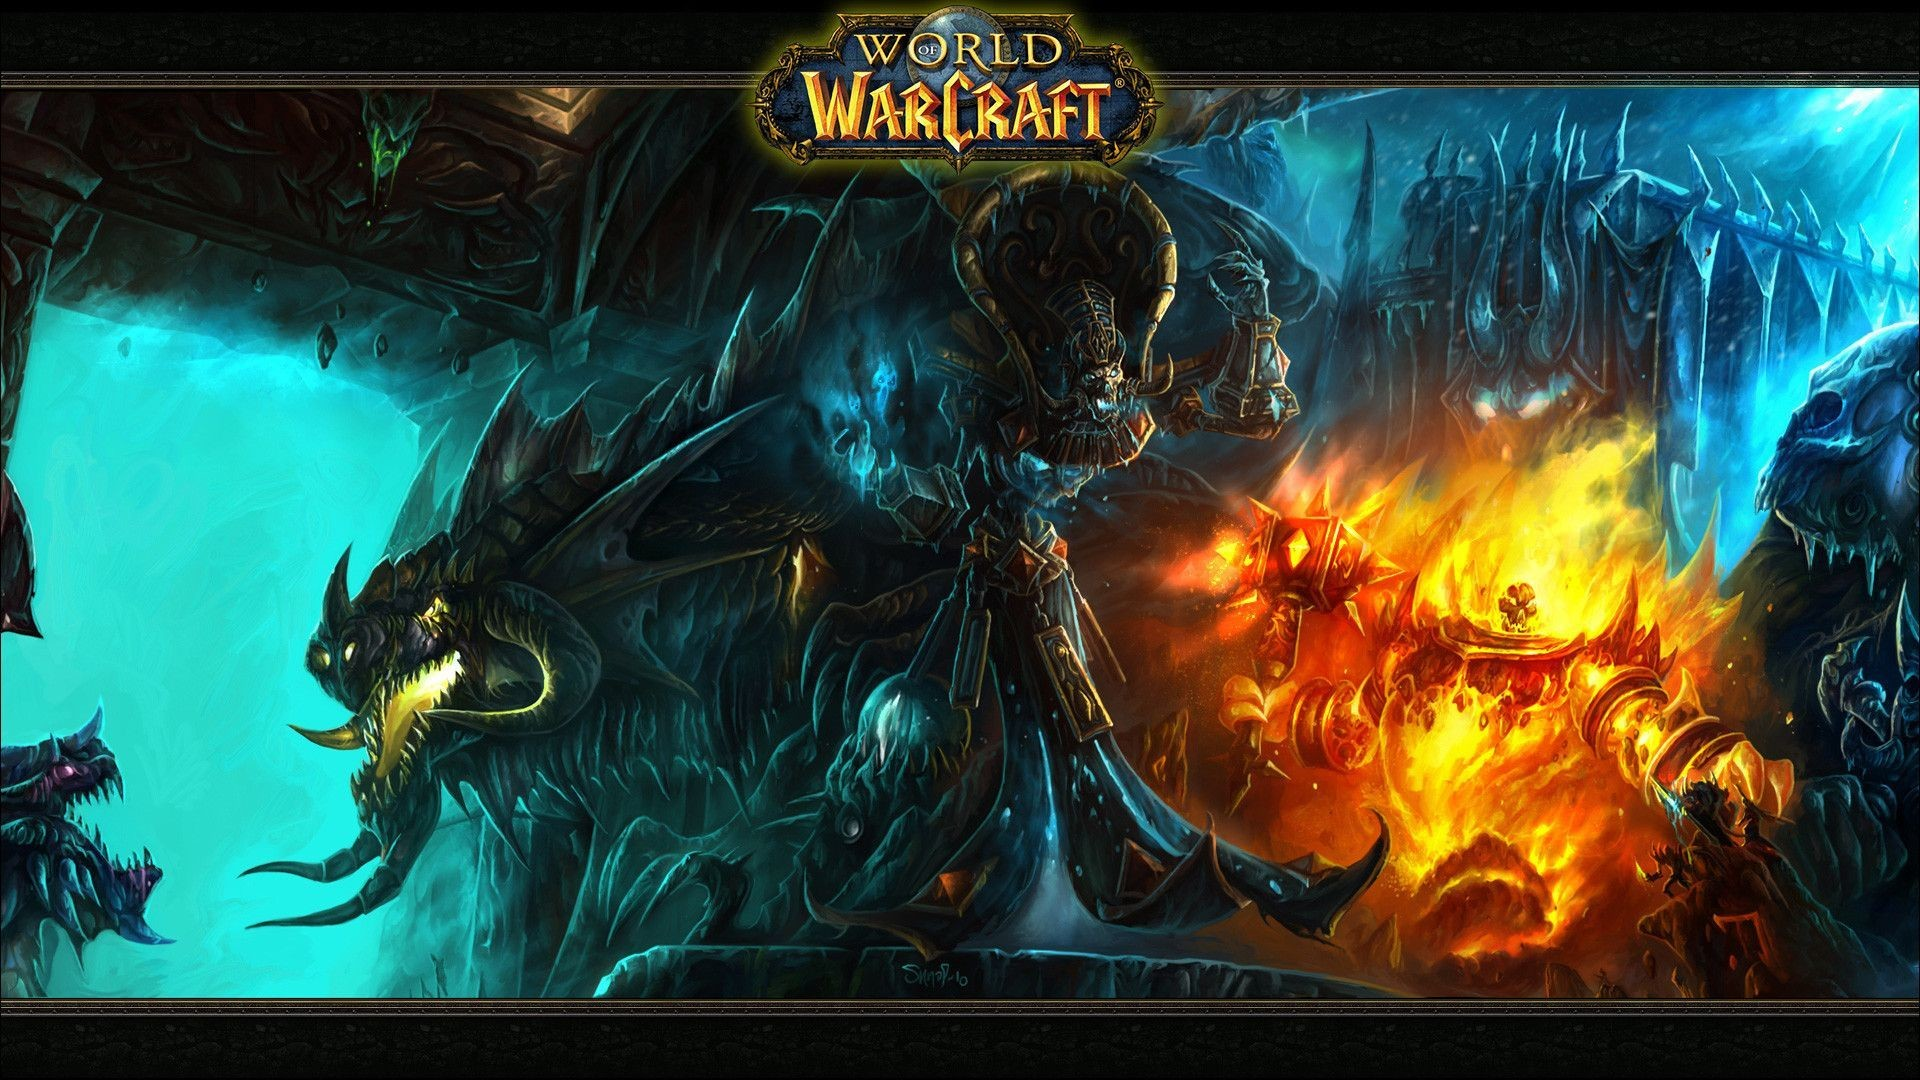 HQ px Resolution World Of Warcraft #841660812 – EW.EDU Wallpapers